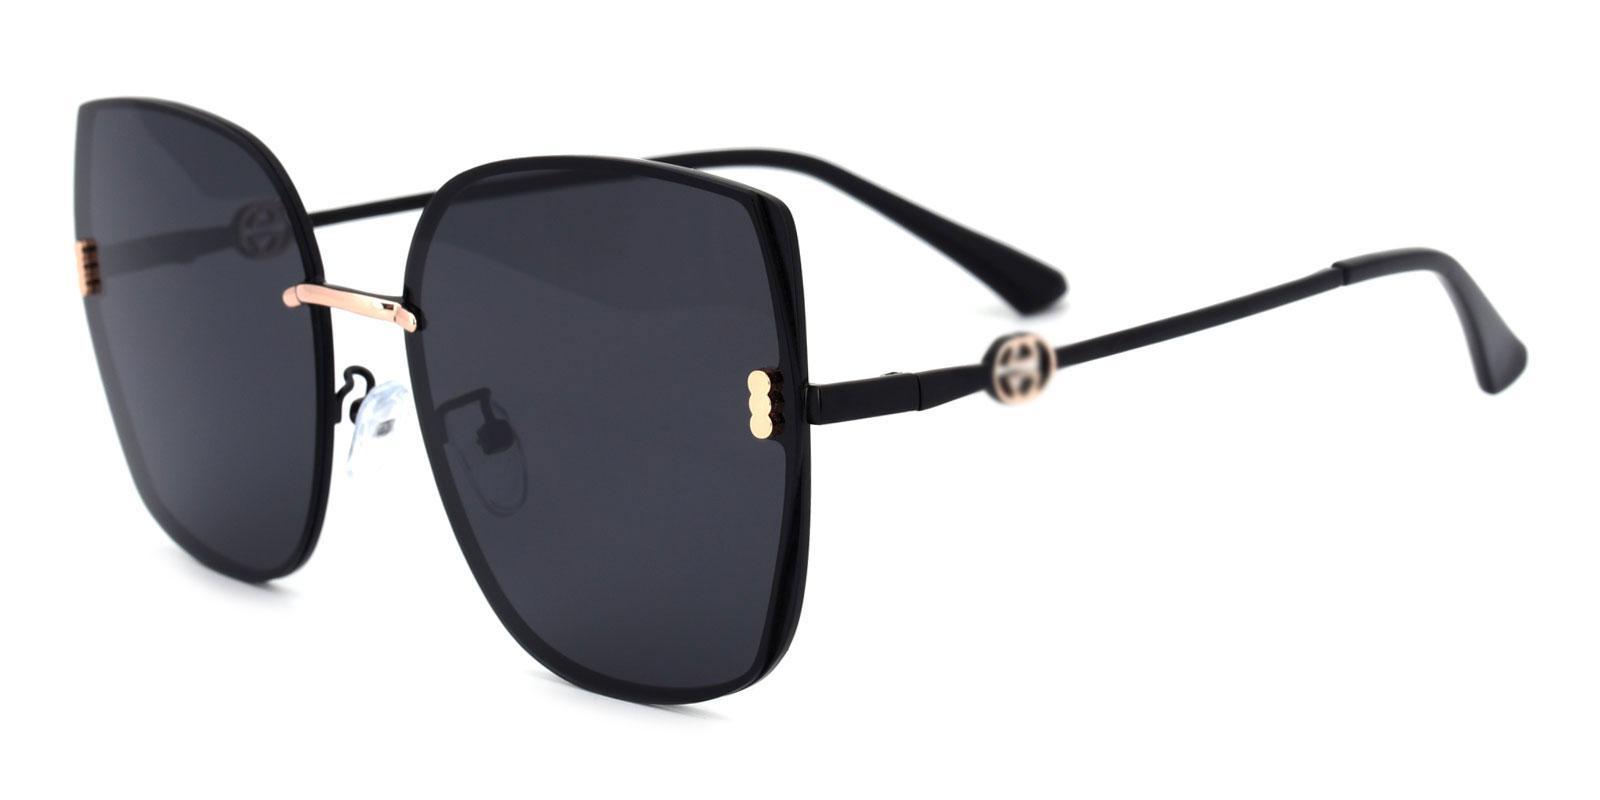 Zed-Black-Square-Metal-Sunglasses-detail